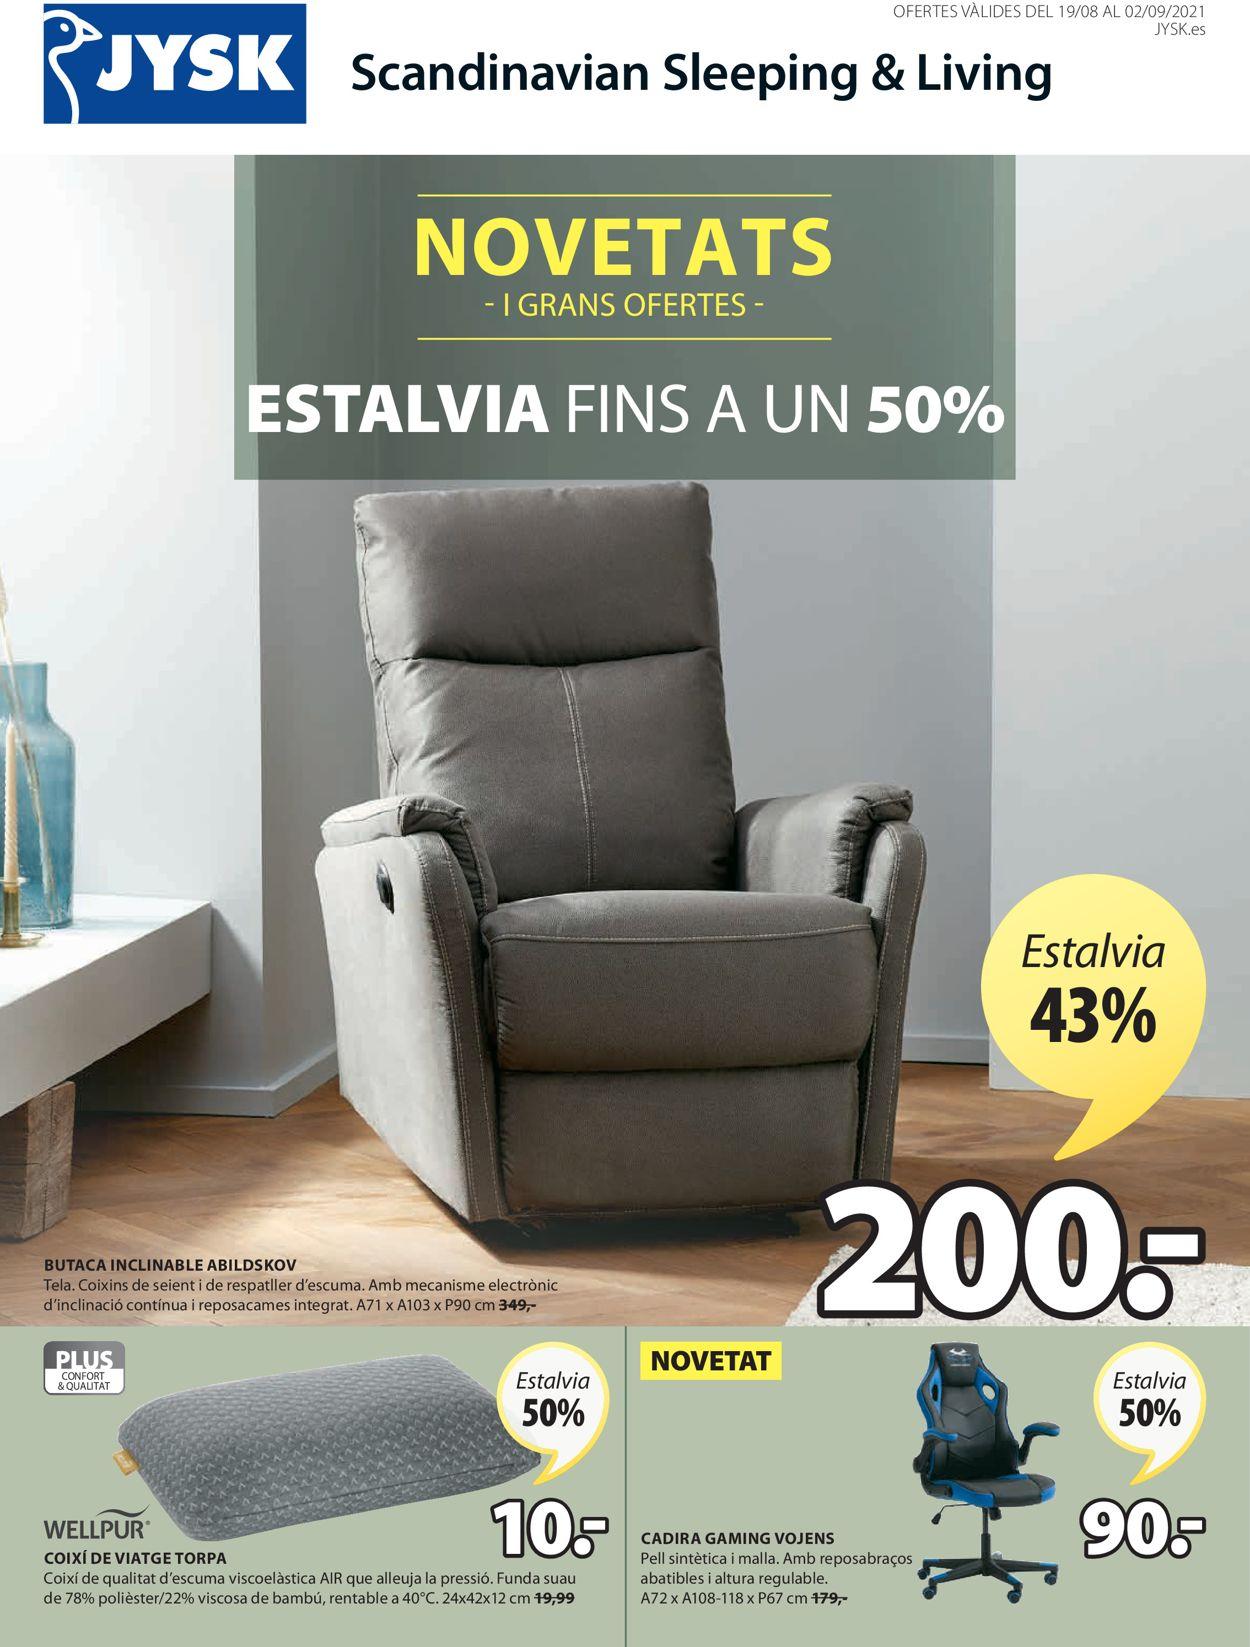 JYSK Folleto - 19.08-02.09.2021